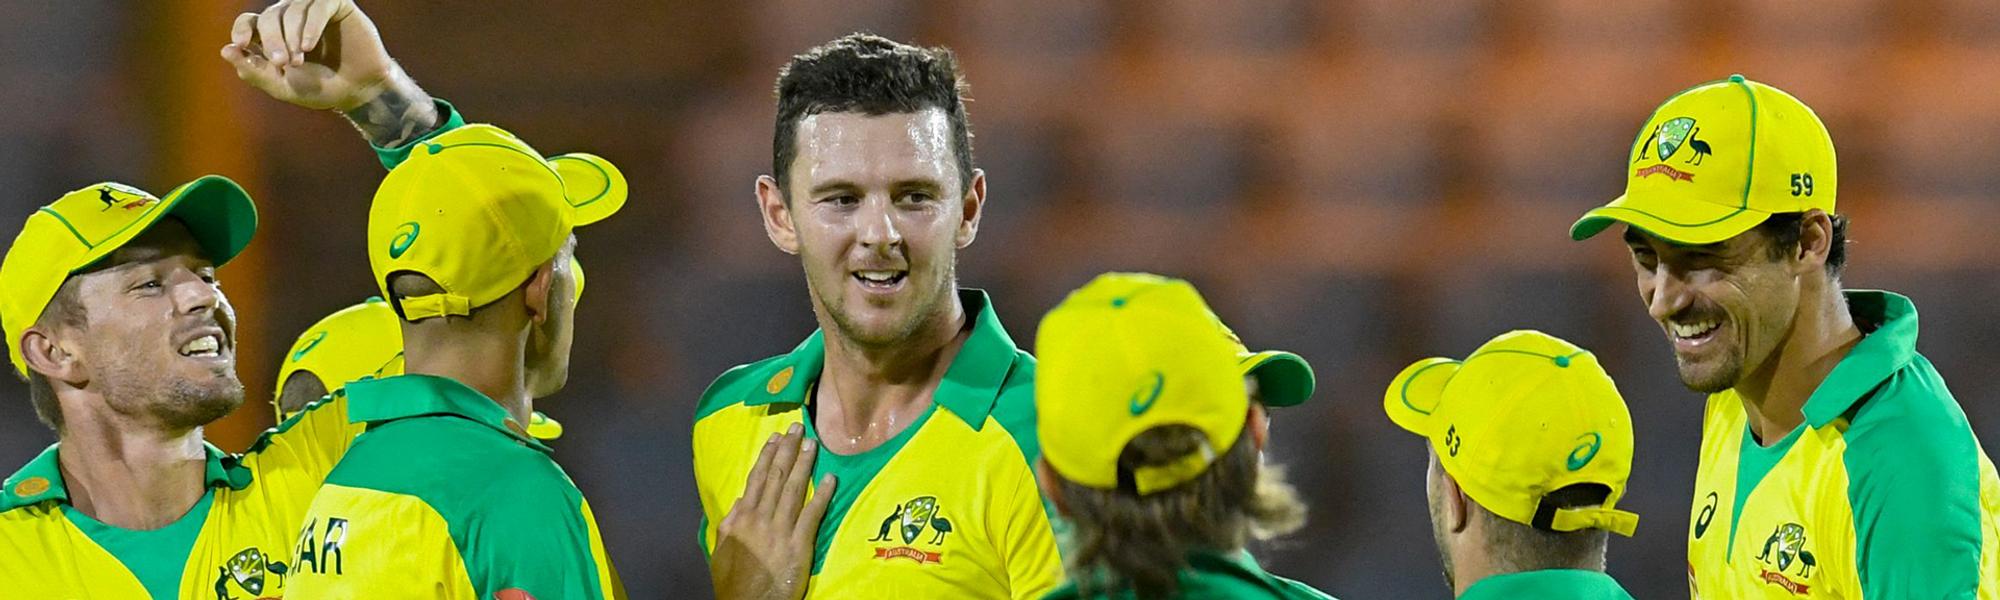 Starc and Hazlewood have climbed the ODI rankings